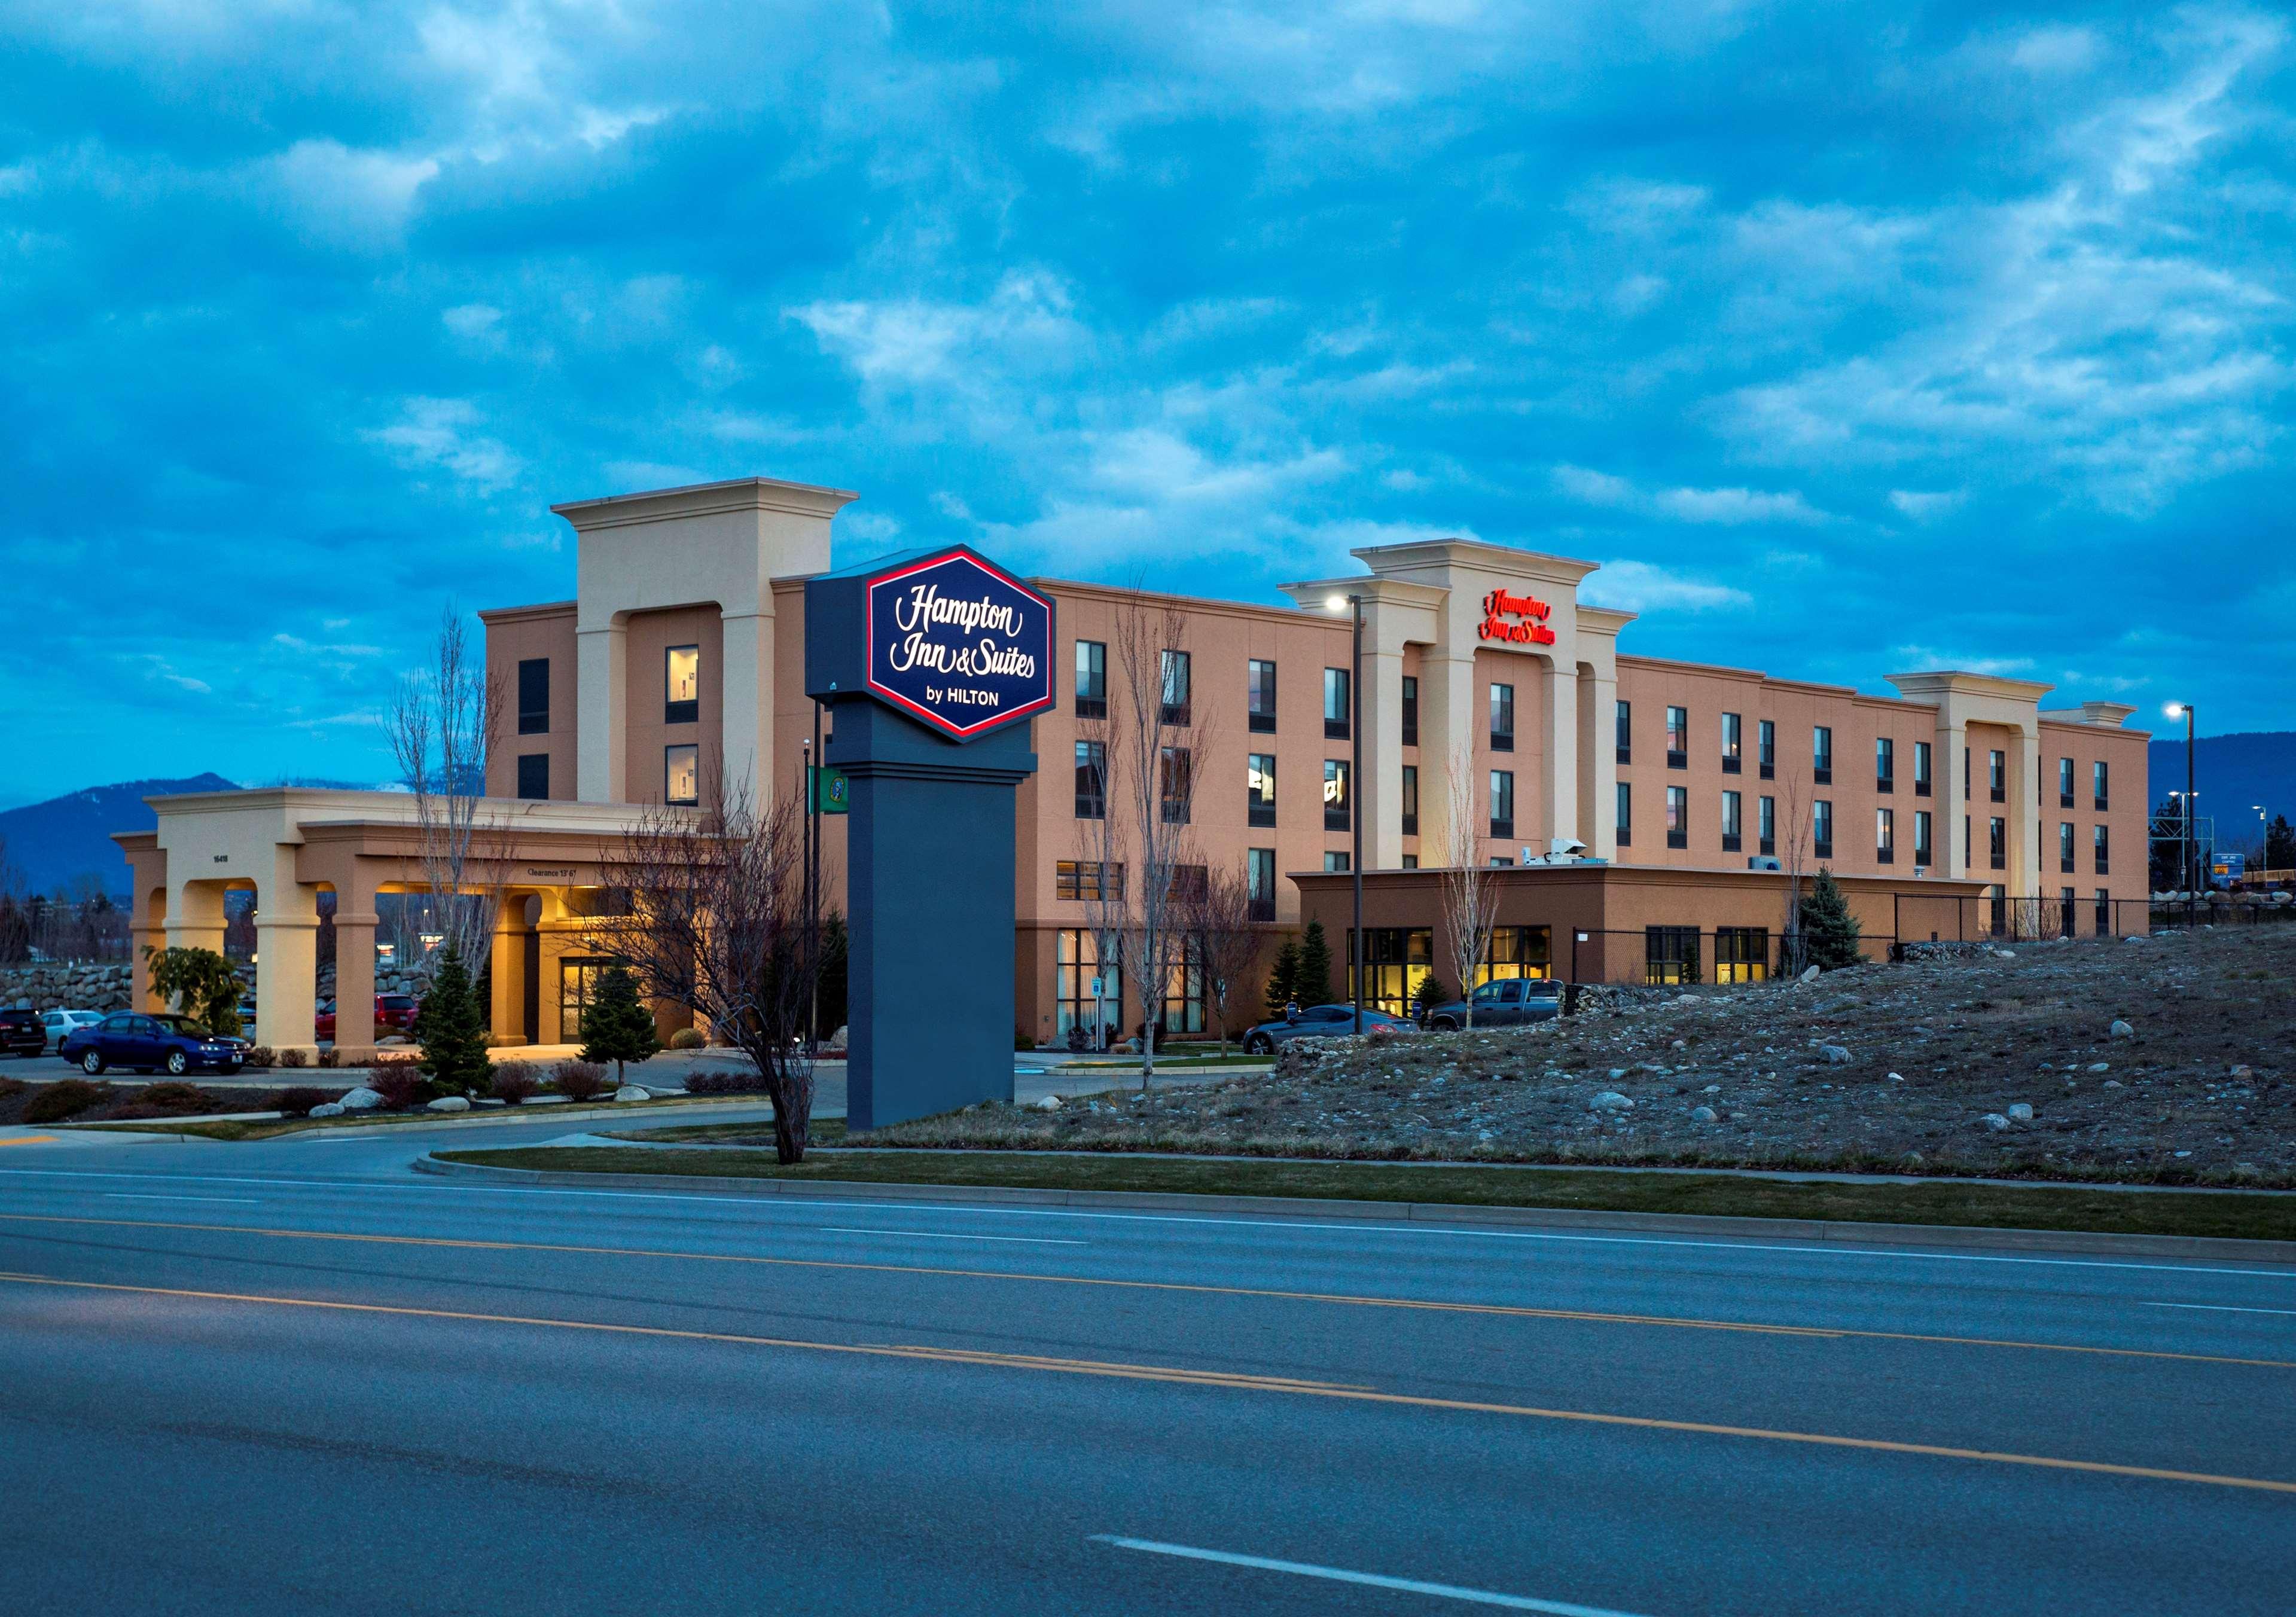 Hampton Inn & Suites Spokane Valley image 0